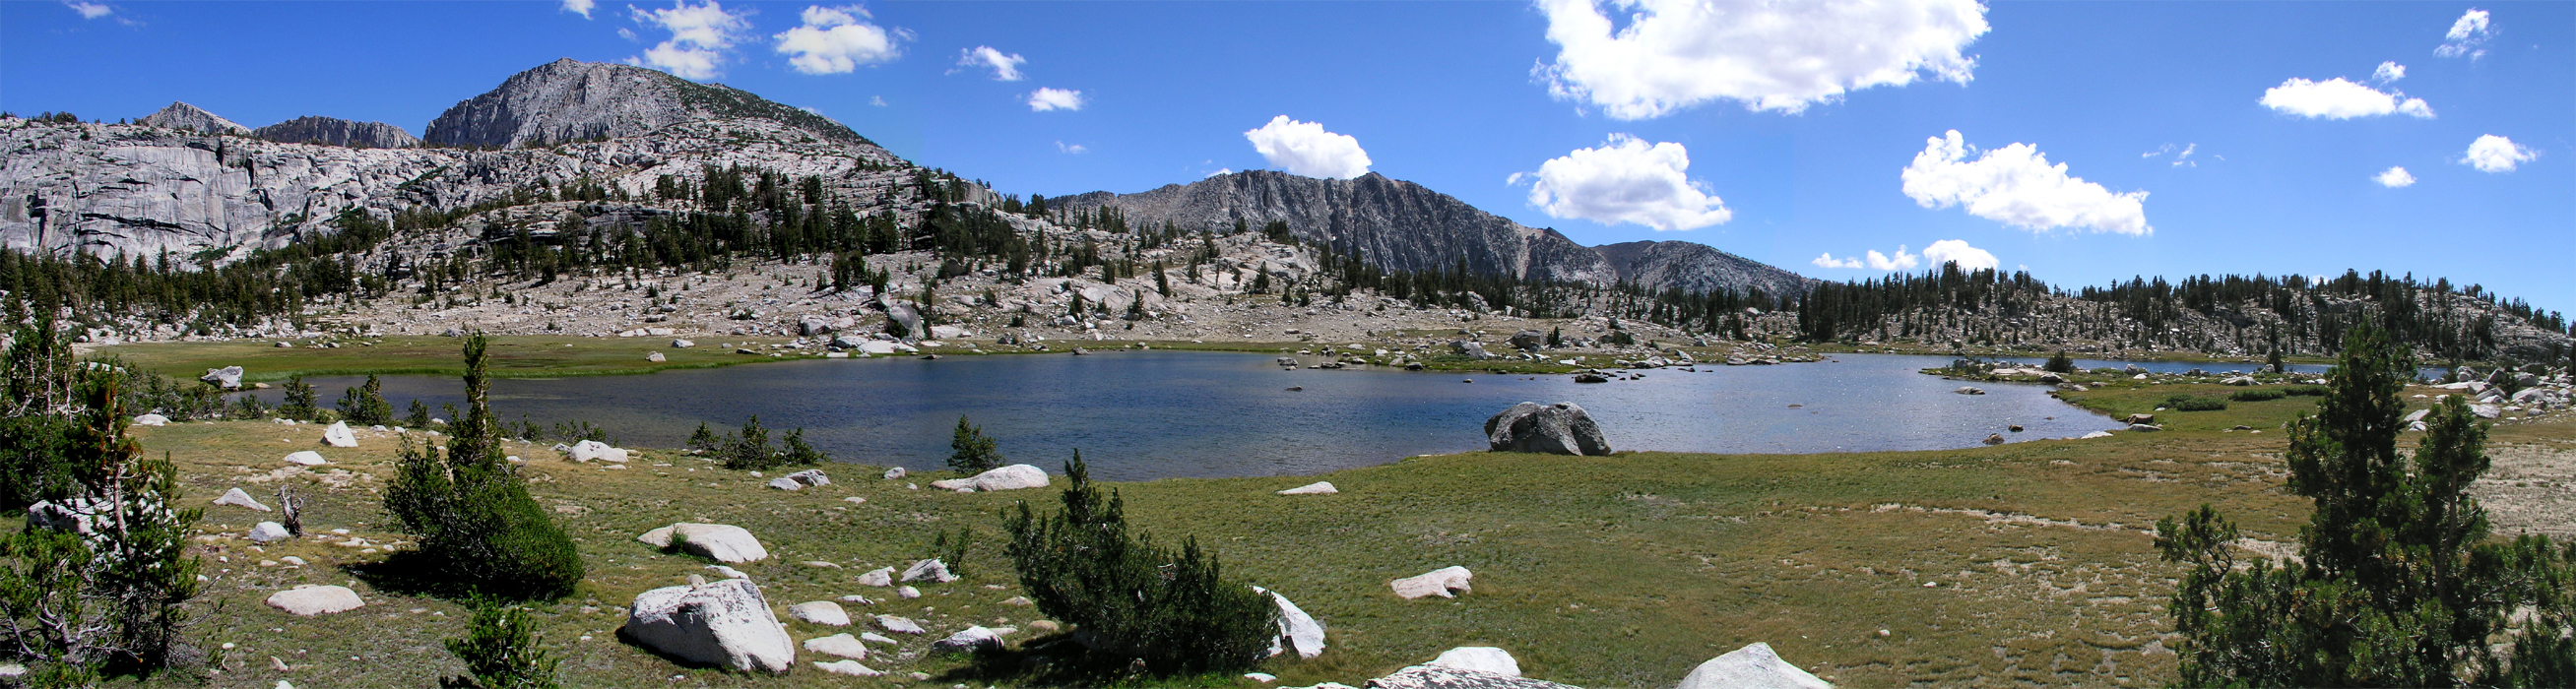 Horse Head Lake, John Muir Wilderness, California